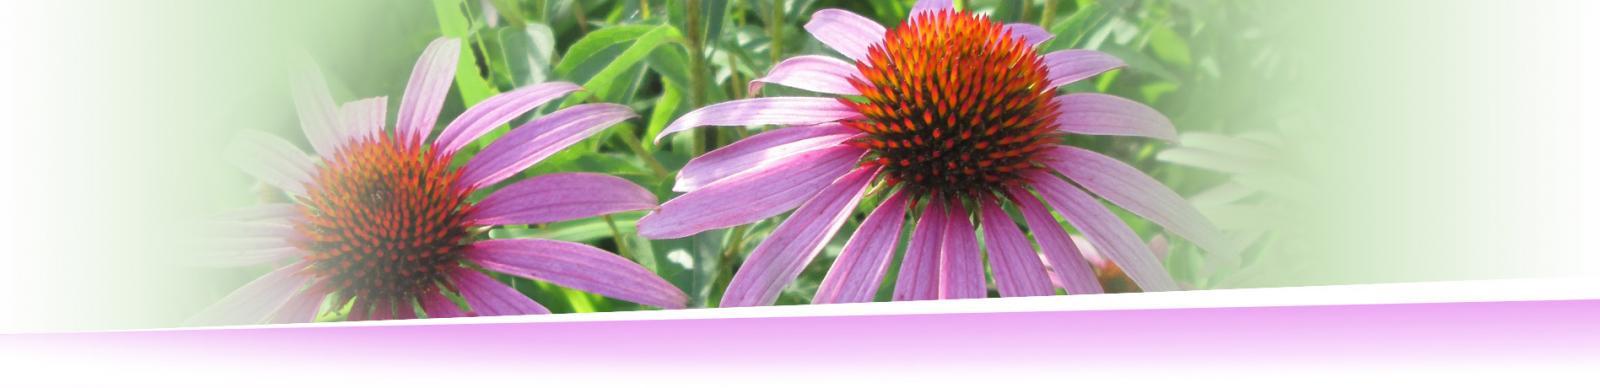 Slide 02 Echinacea